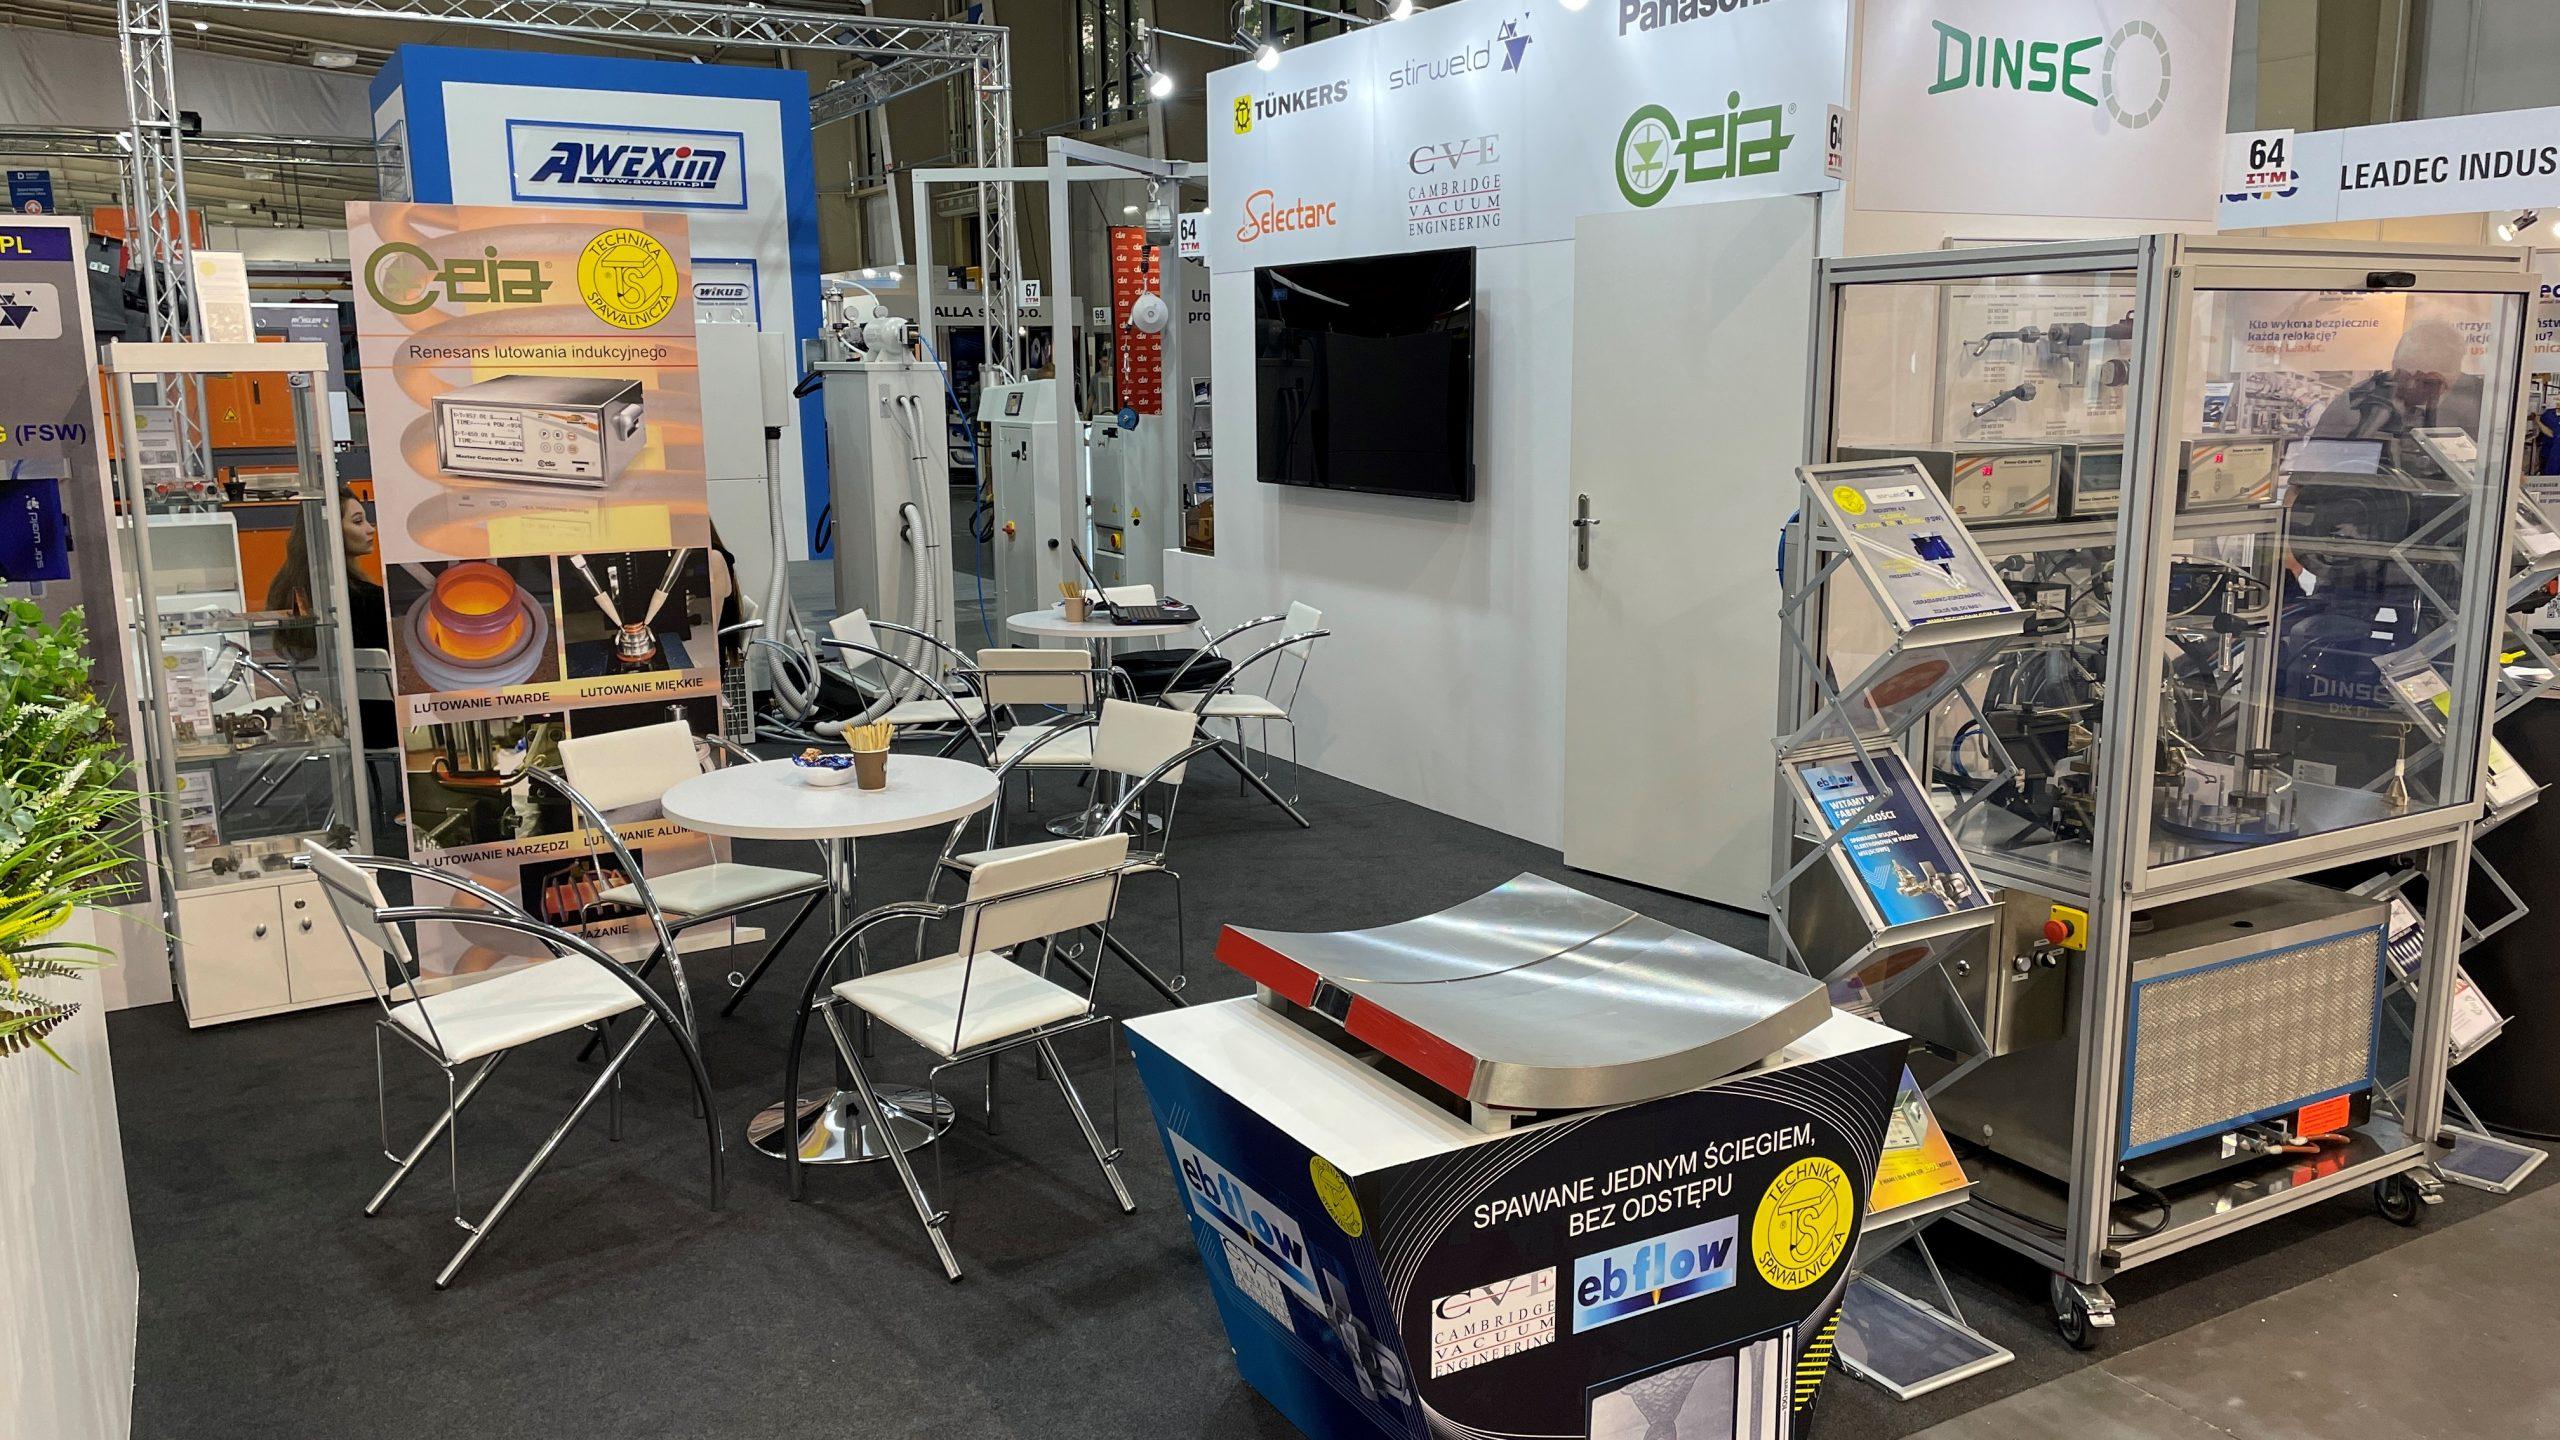 CVE Exhibit at ITM Industry Europe Trade Fair